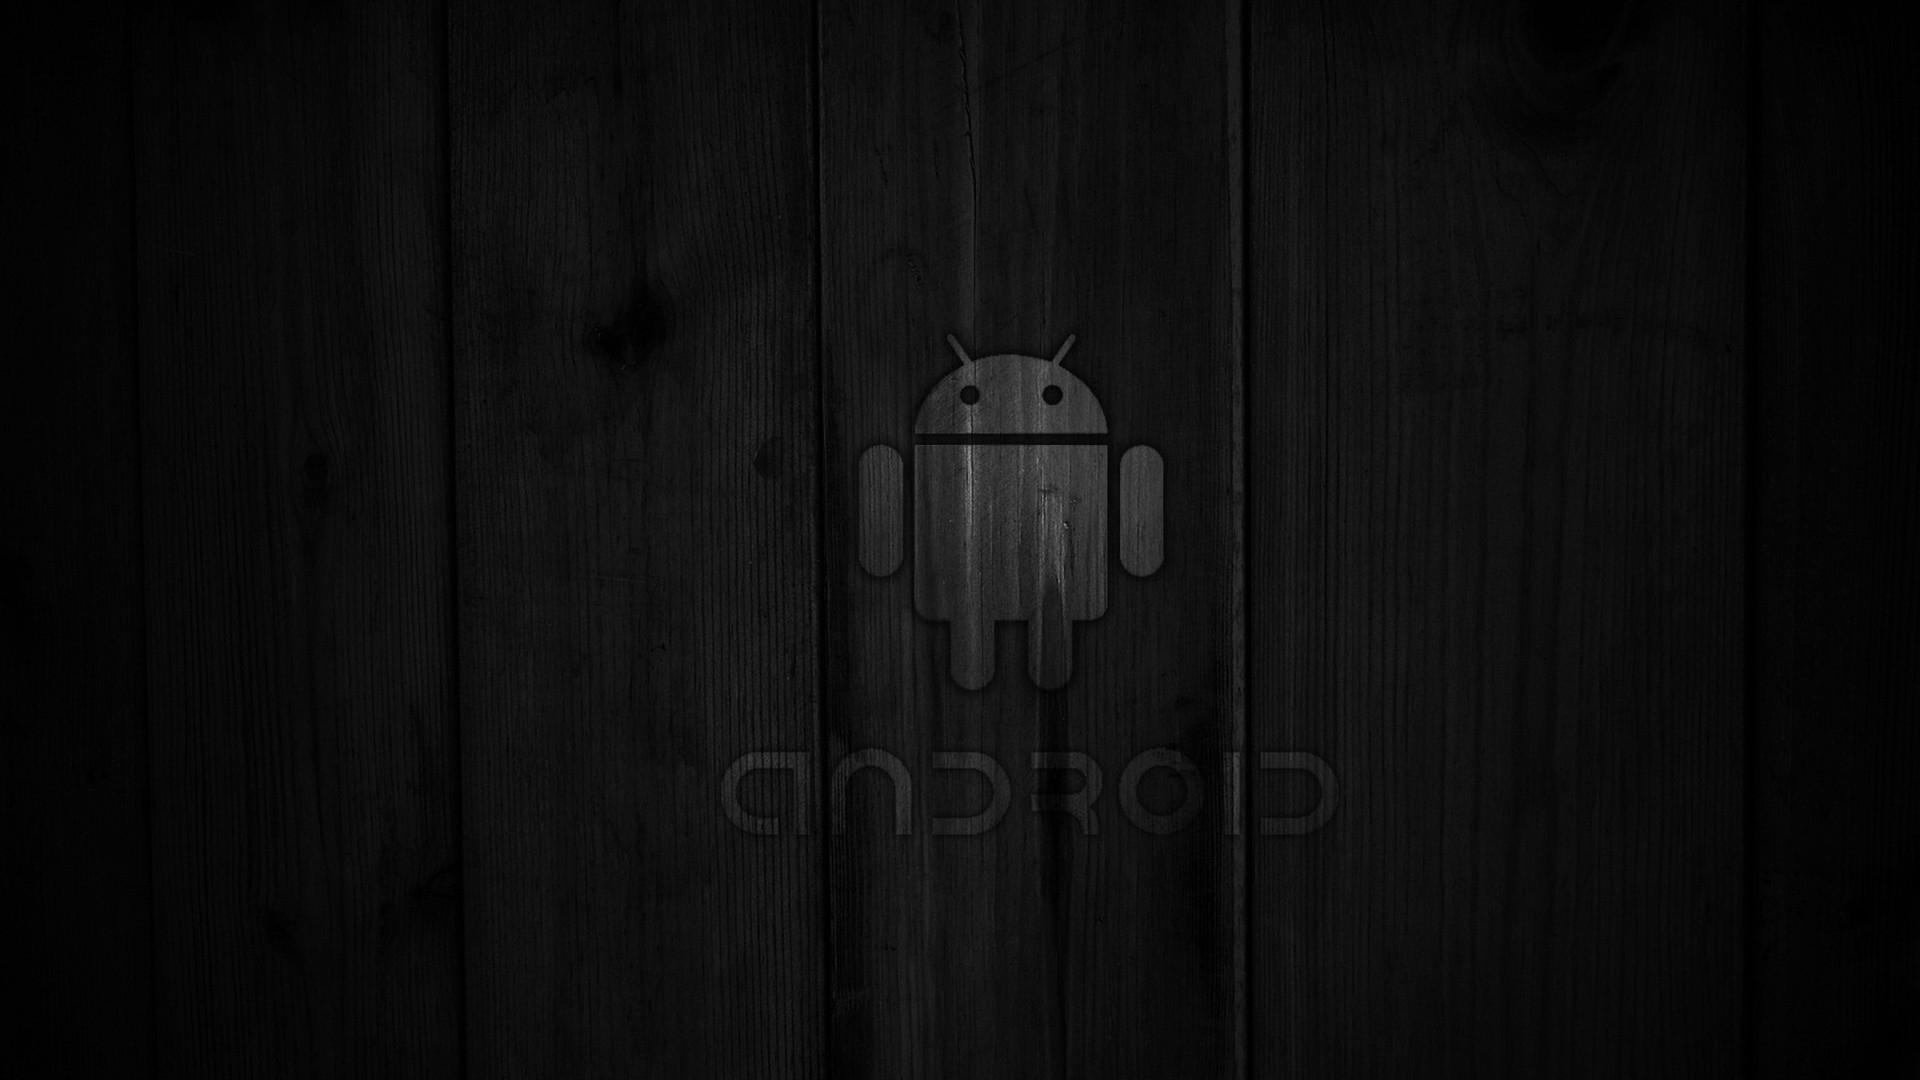 70 Black Wallpaper For Android On Wallpapersafari